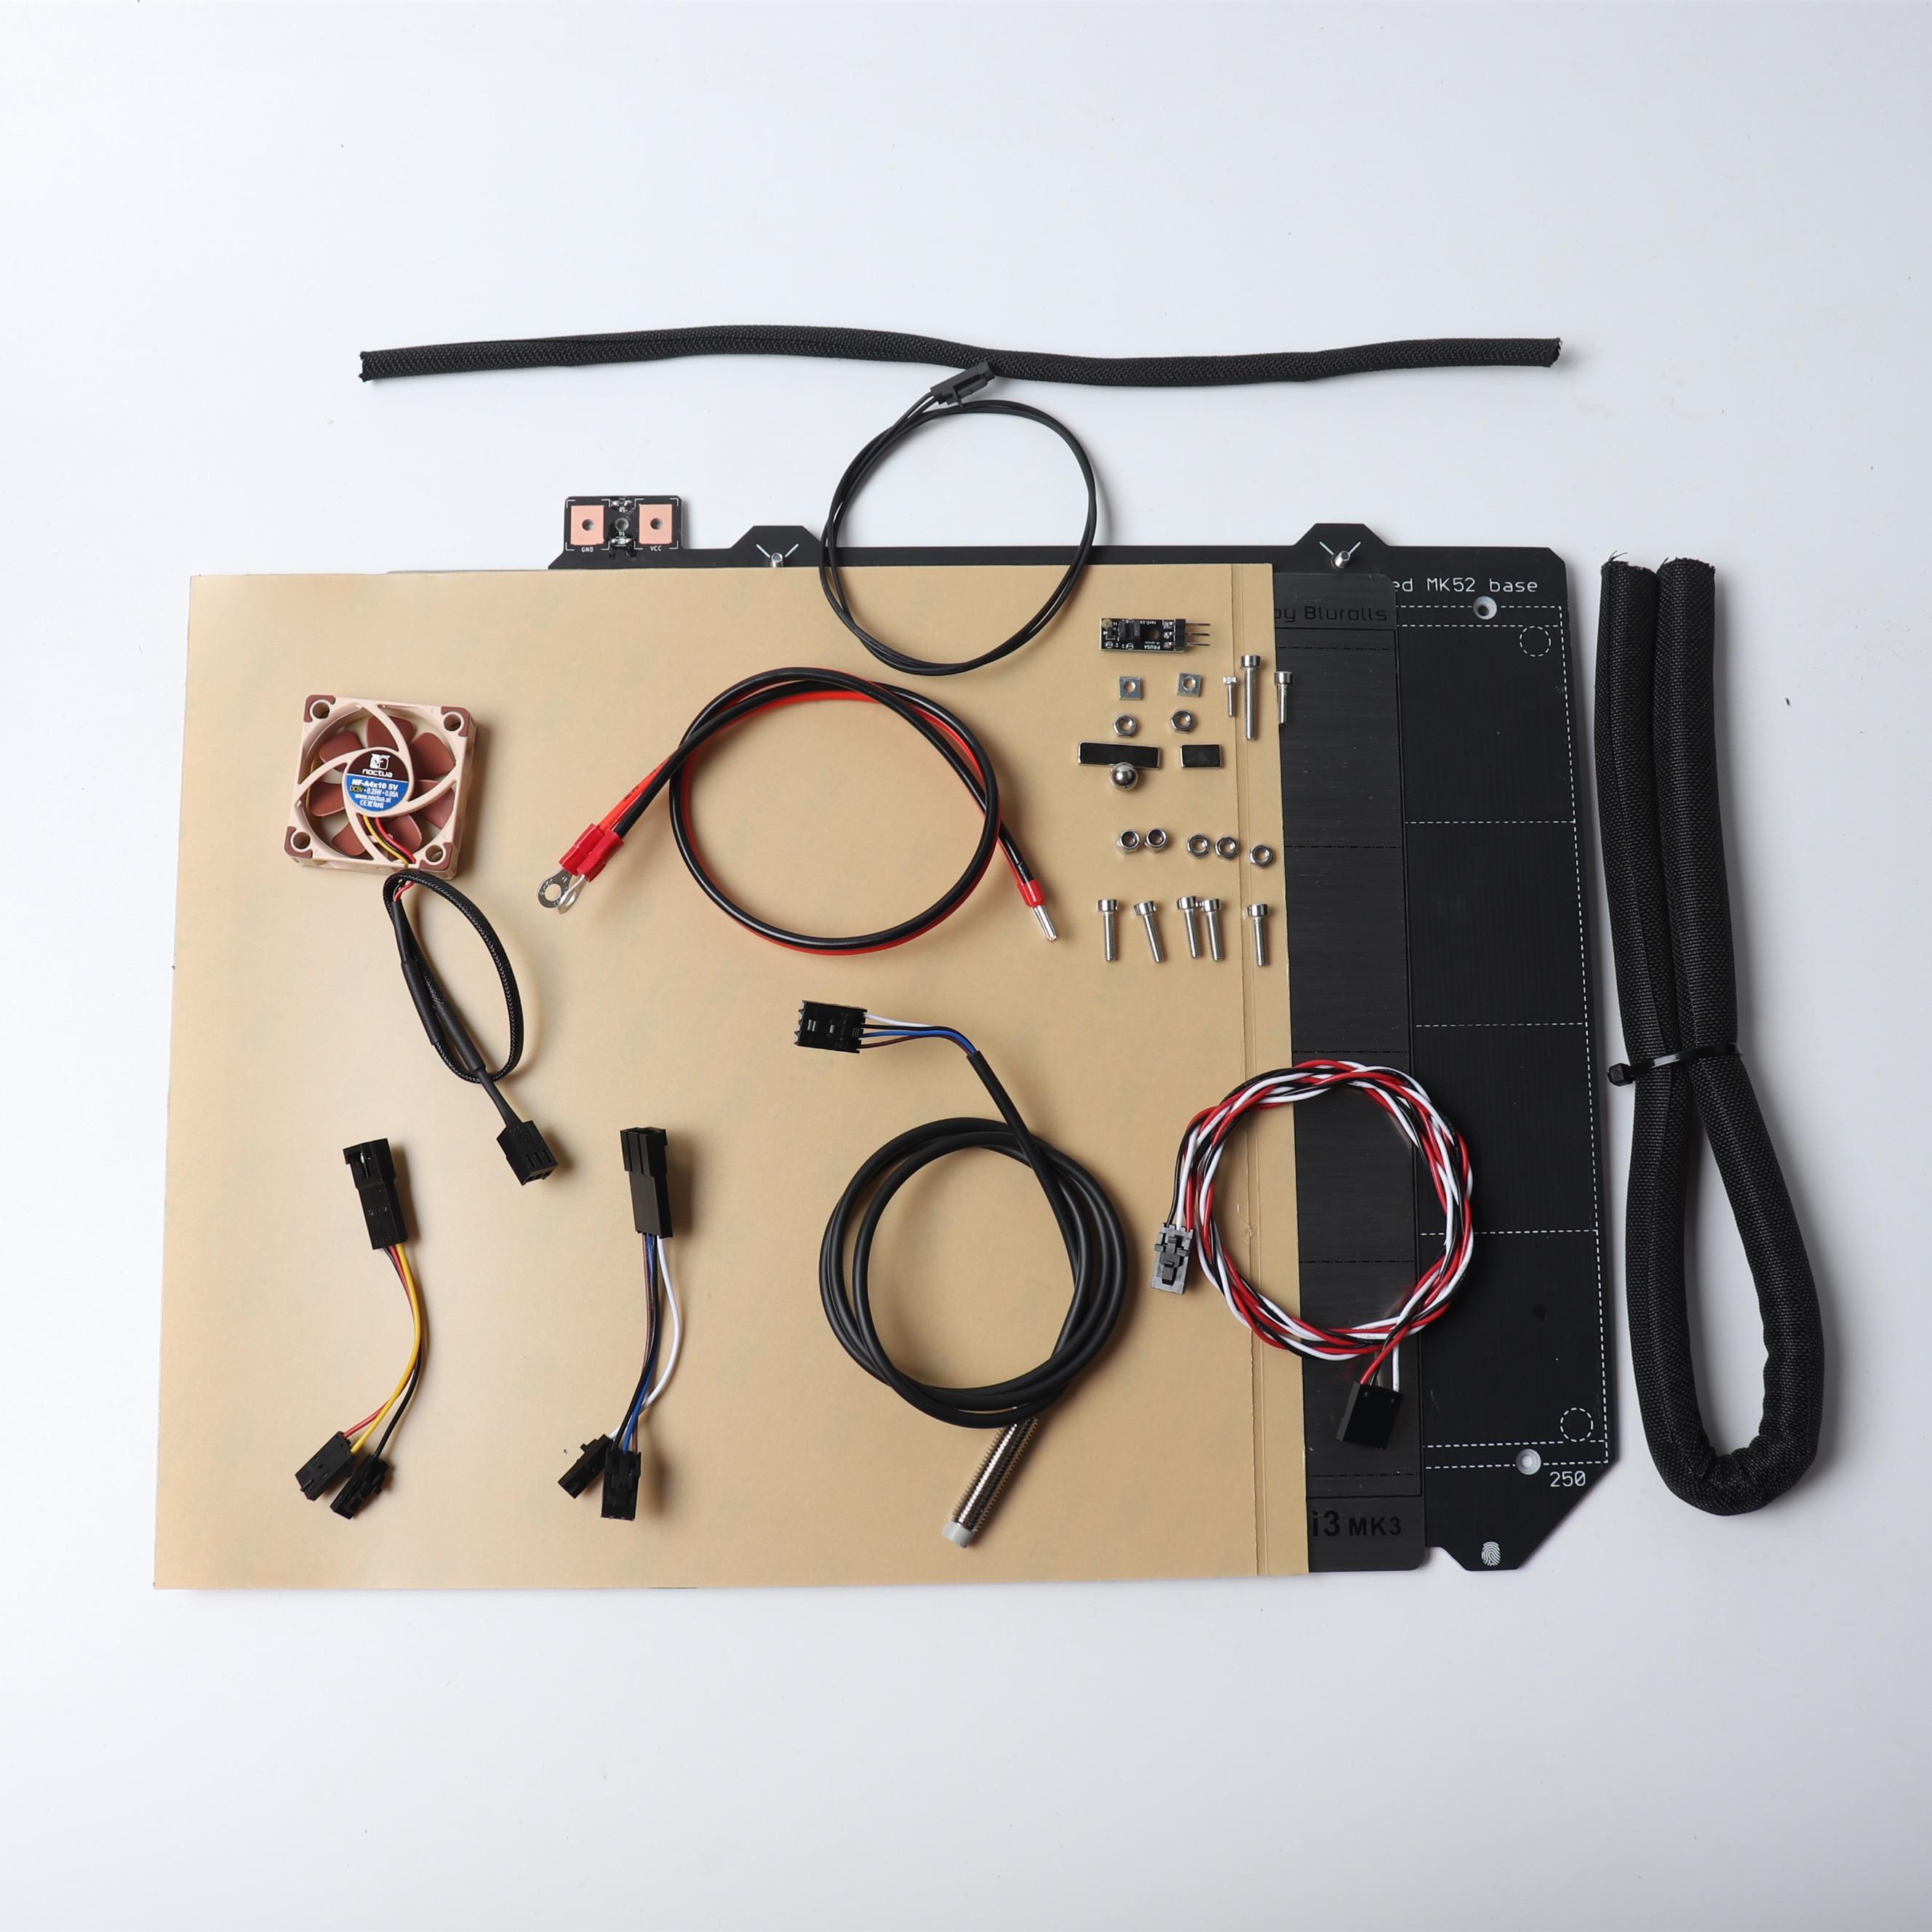 Tronxy X5S To X5SA or X5S-400 to X5SA-400 Upgrade kit Touch